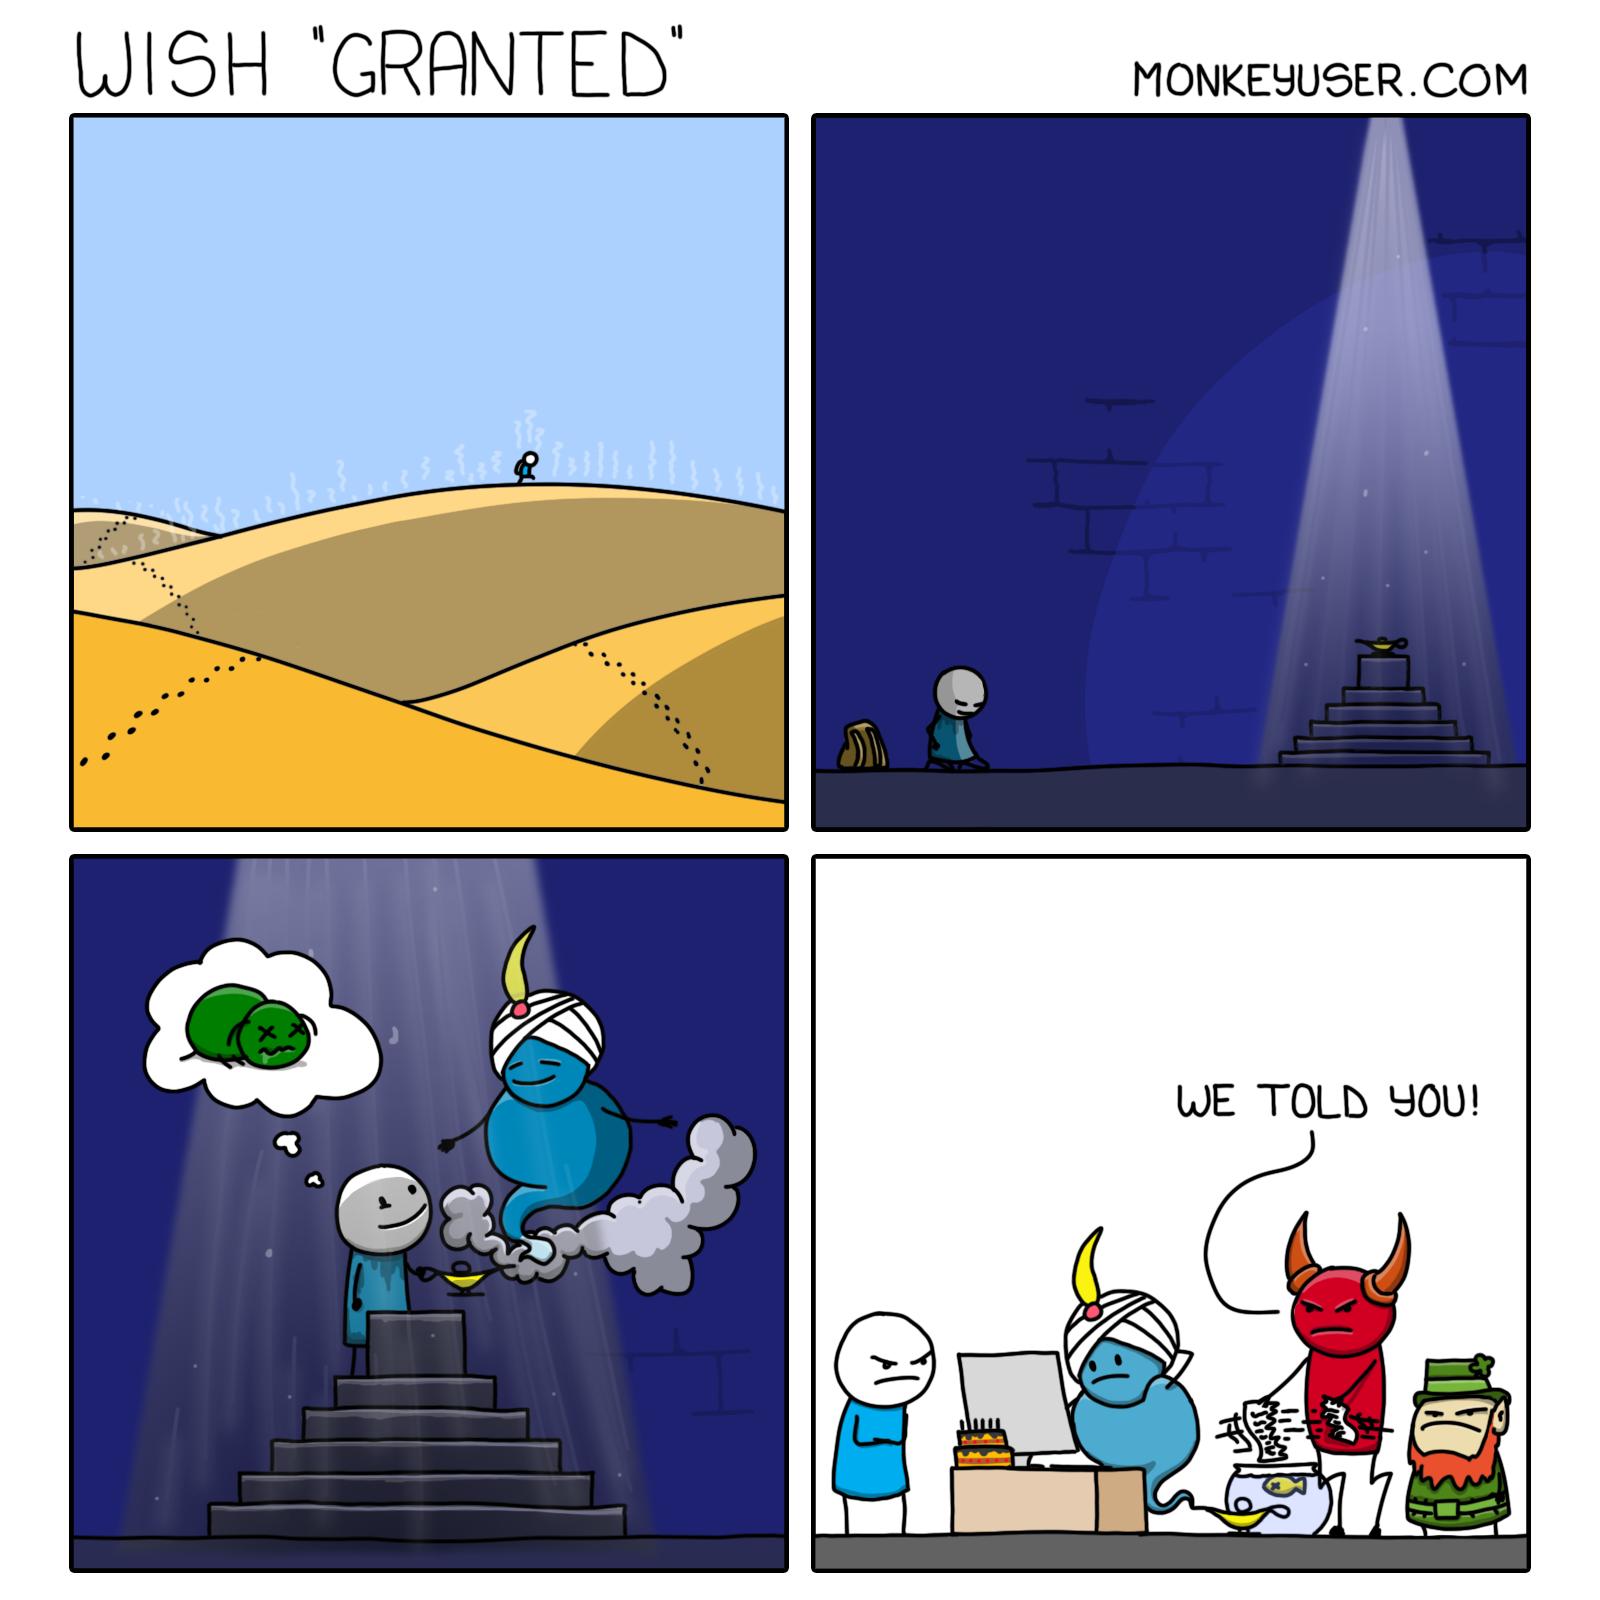 Wish 'Granted'